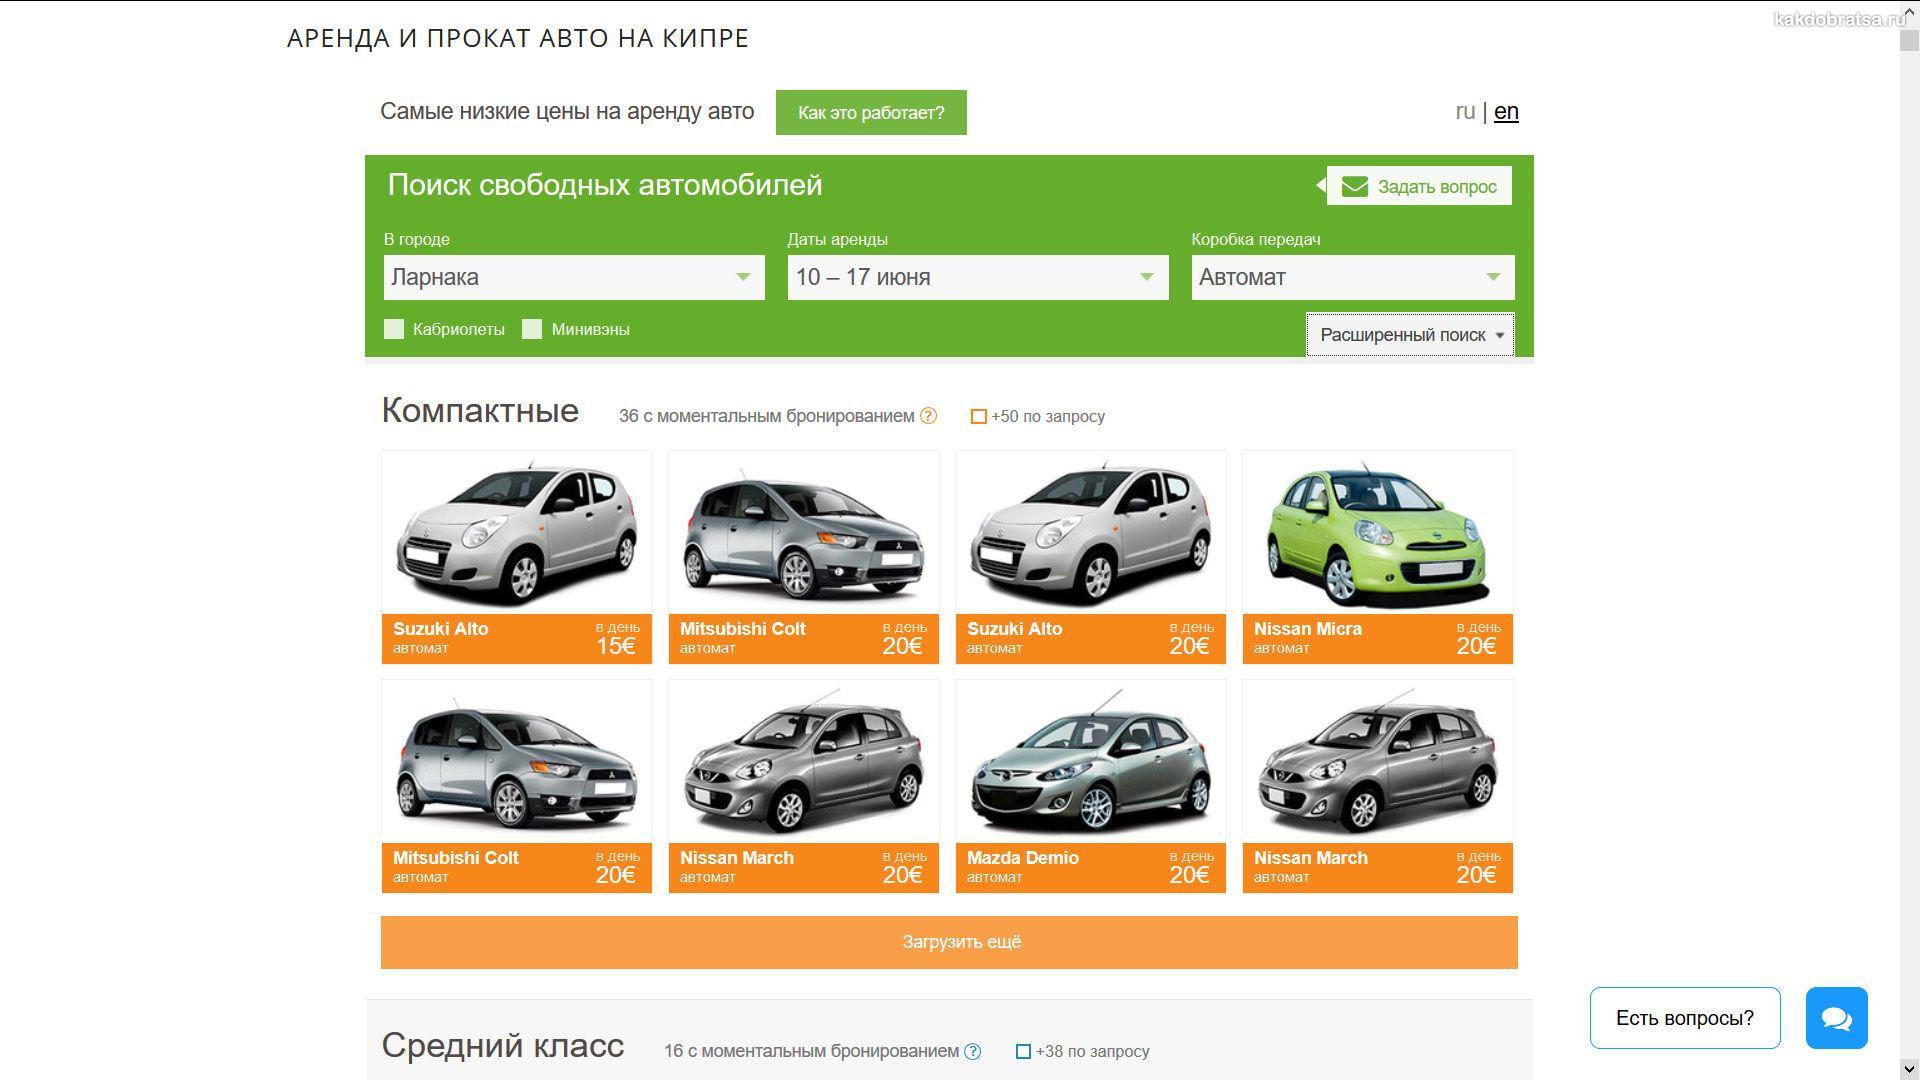 Недорогая аренда авто на Кипре без залога